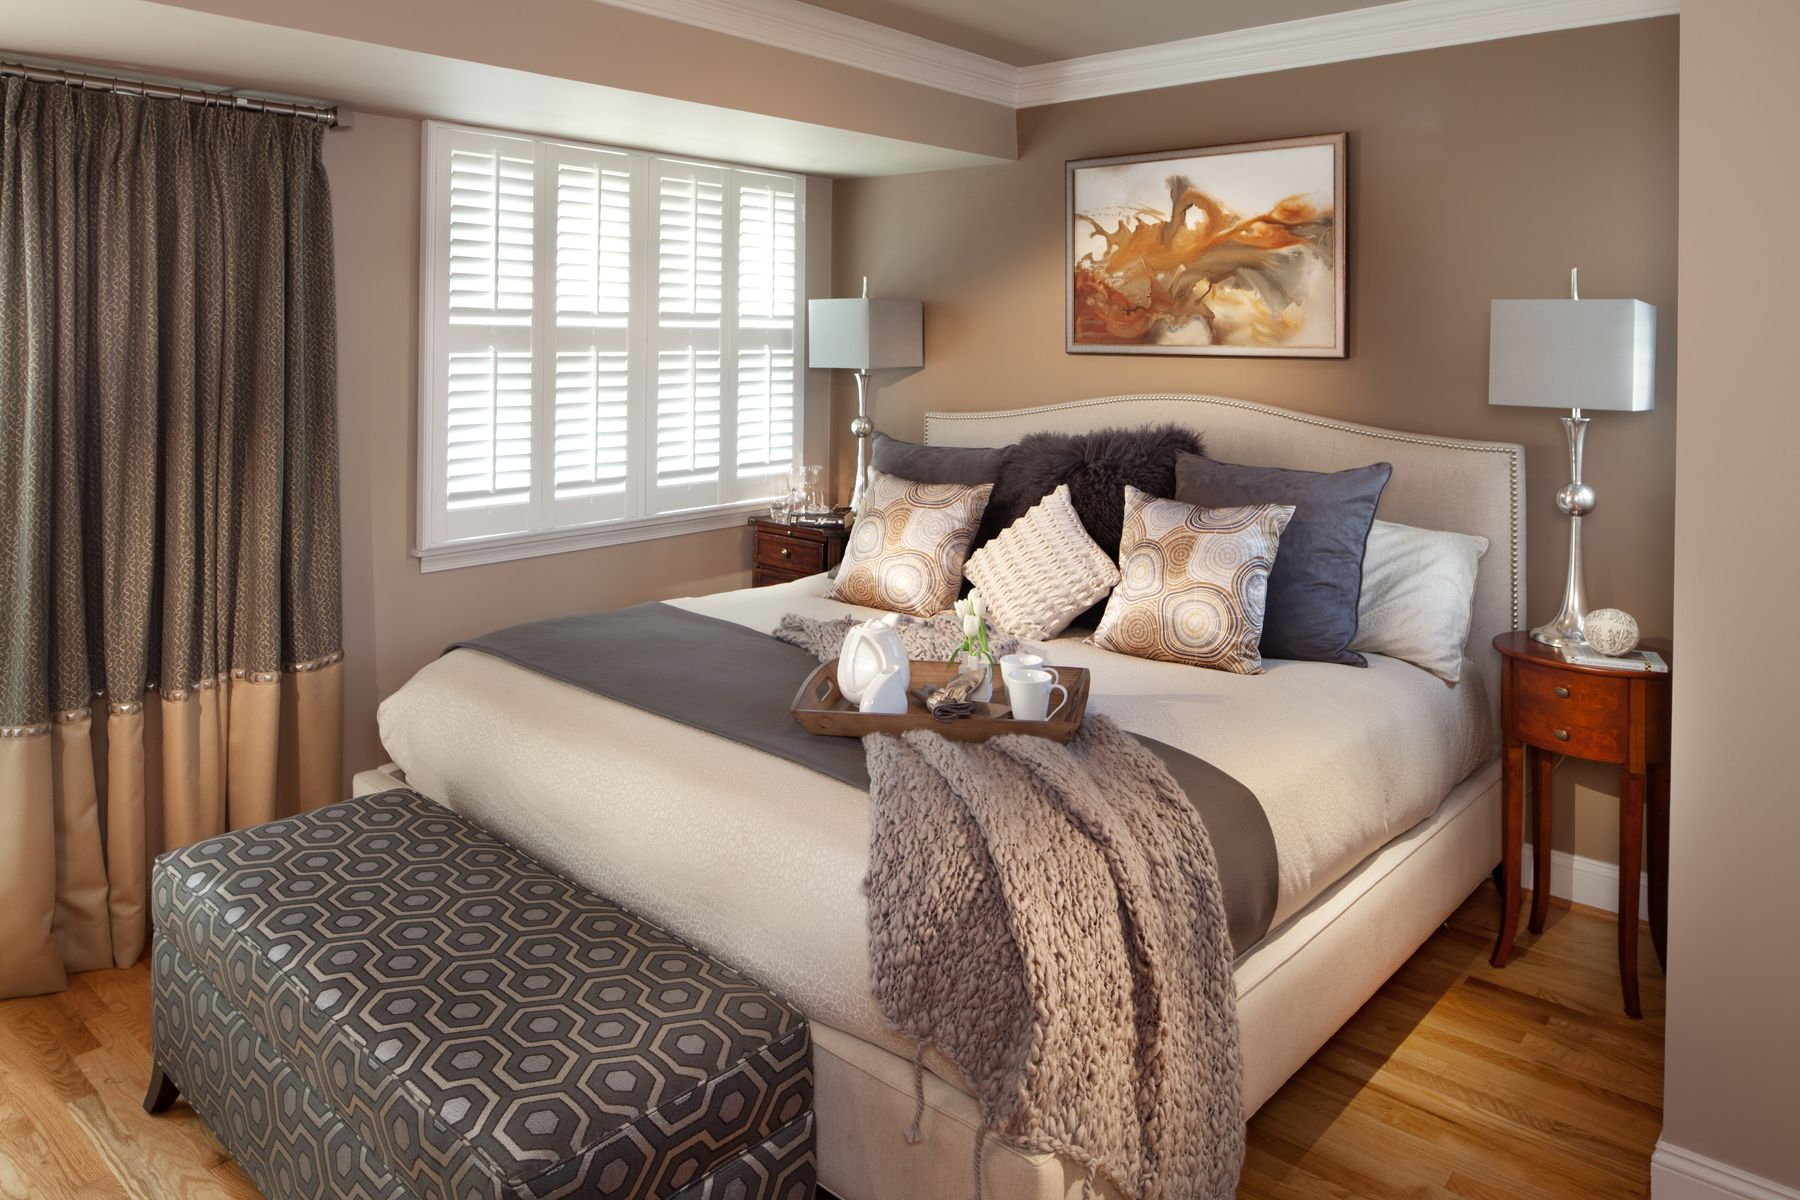 warm colored bedrooms google search paint color for bedroom wardrobe inside designs for bedroom - Warm Bedroom Designs